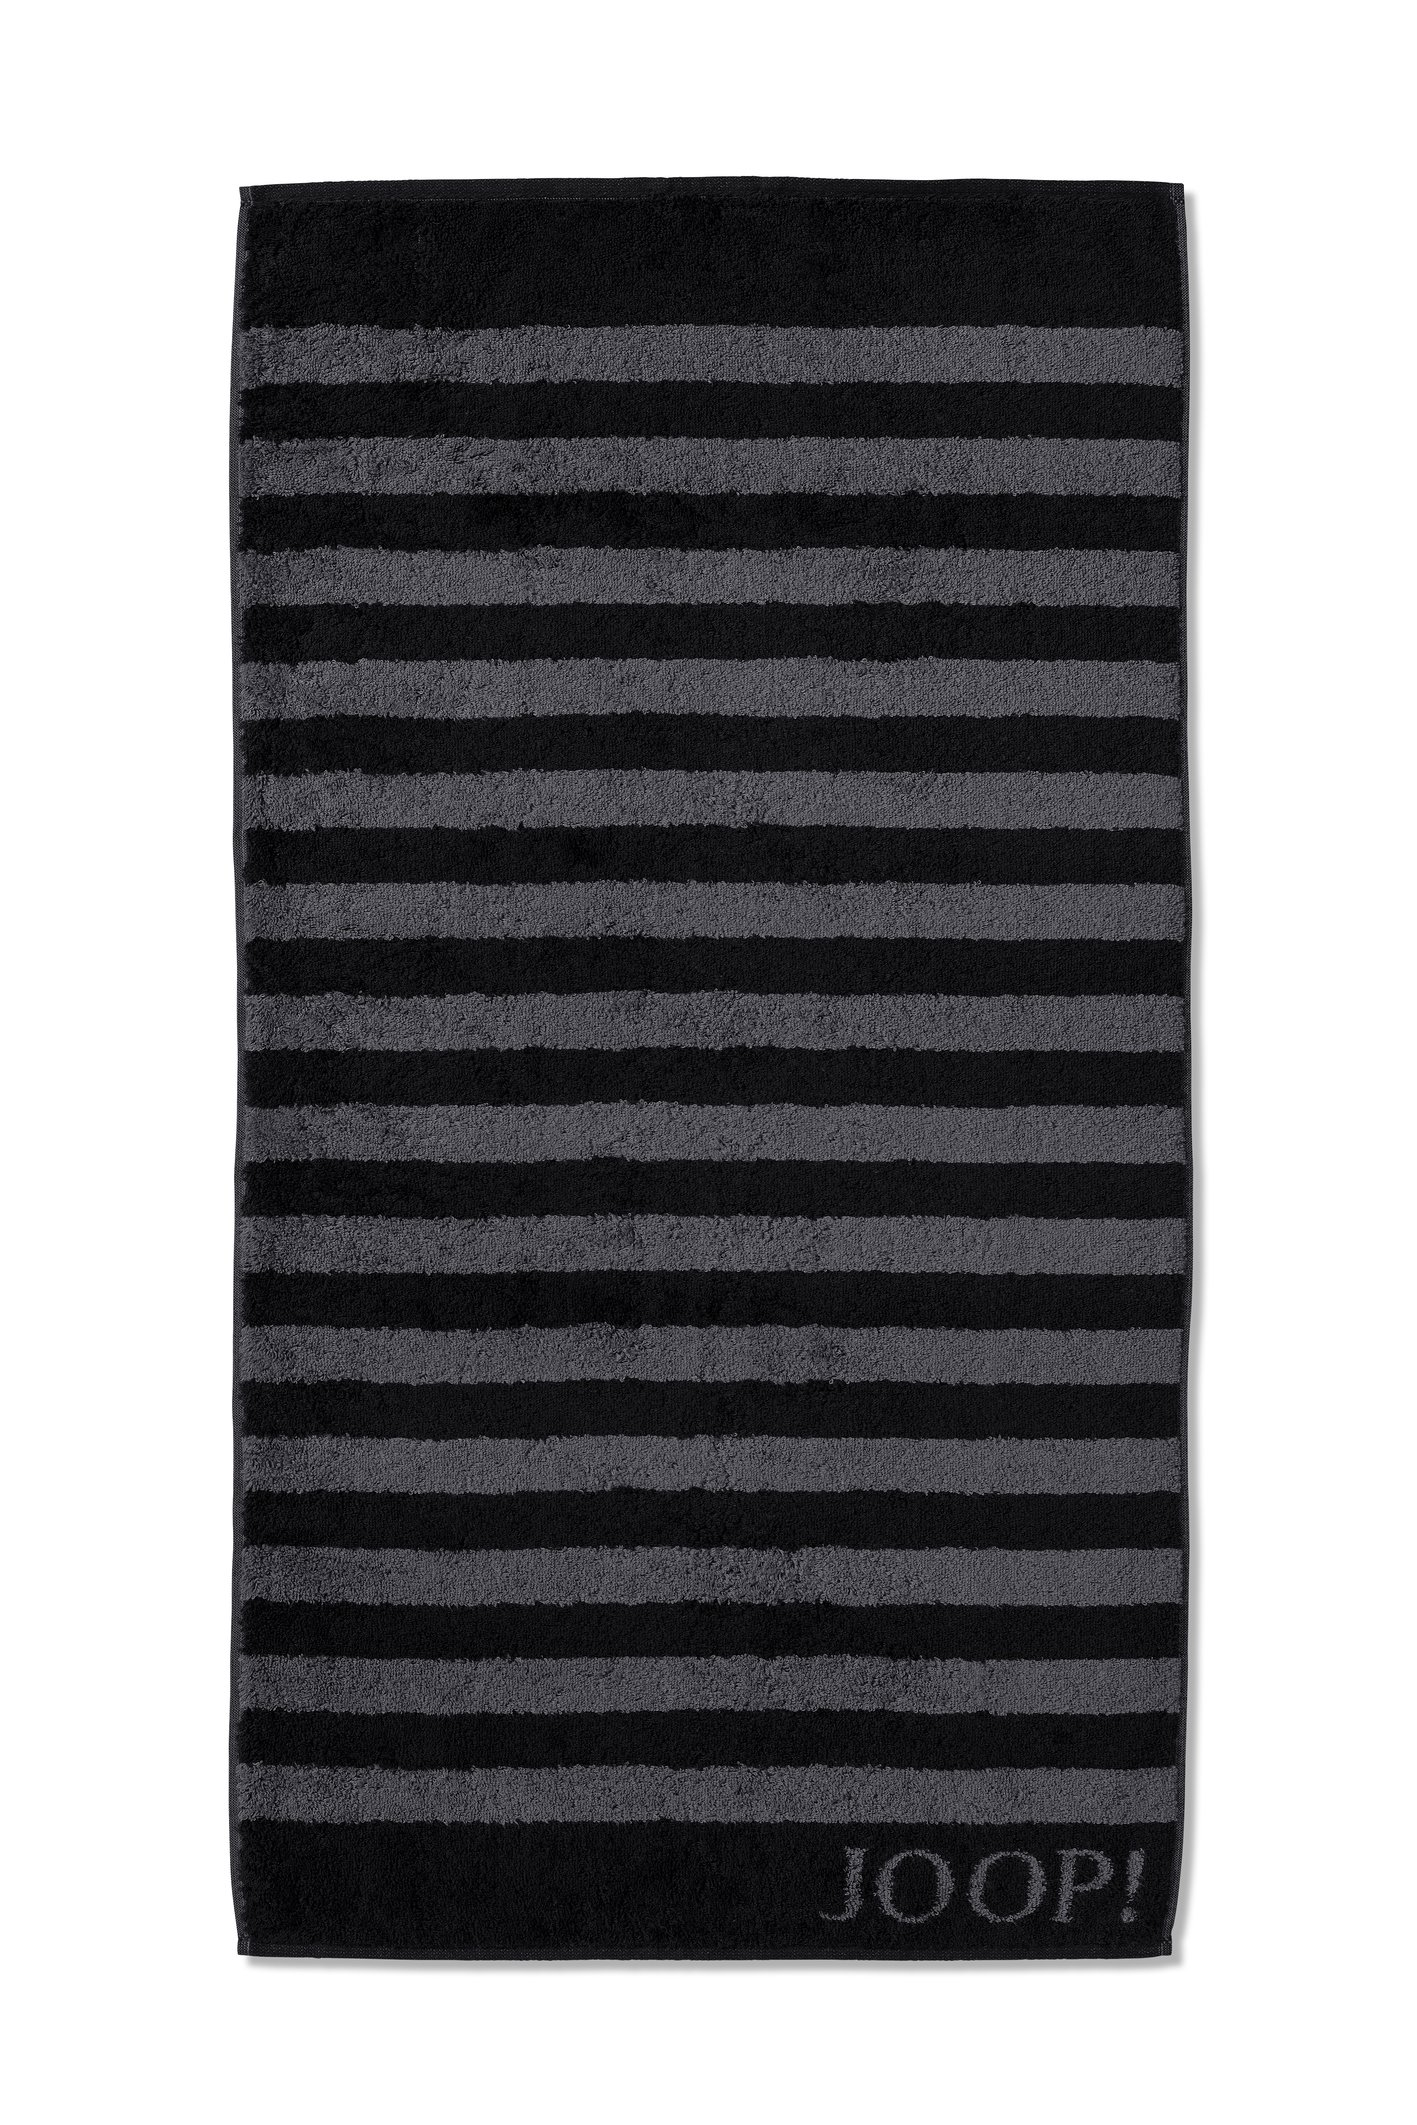 JOOP! Classic Stripes Duschtuch 80x150 cm 1610-90 Schwarz